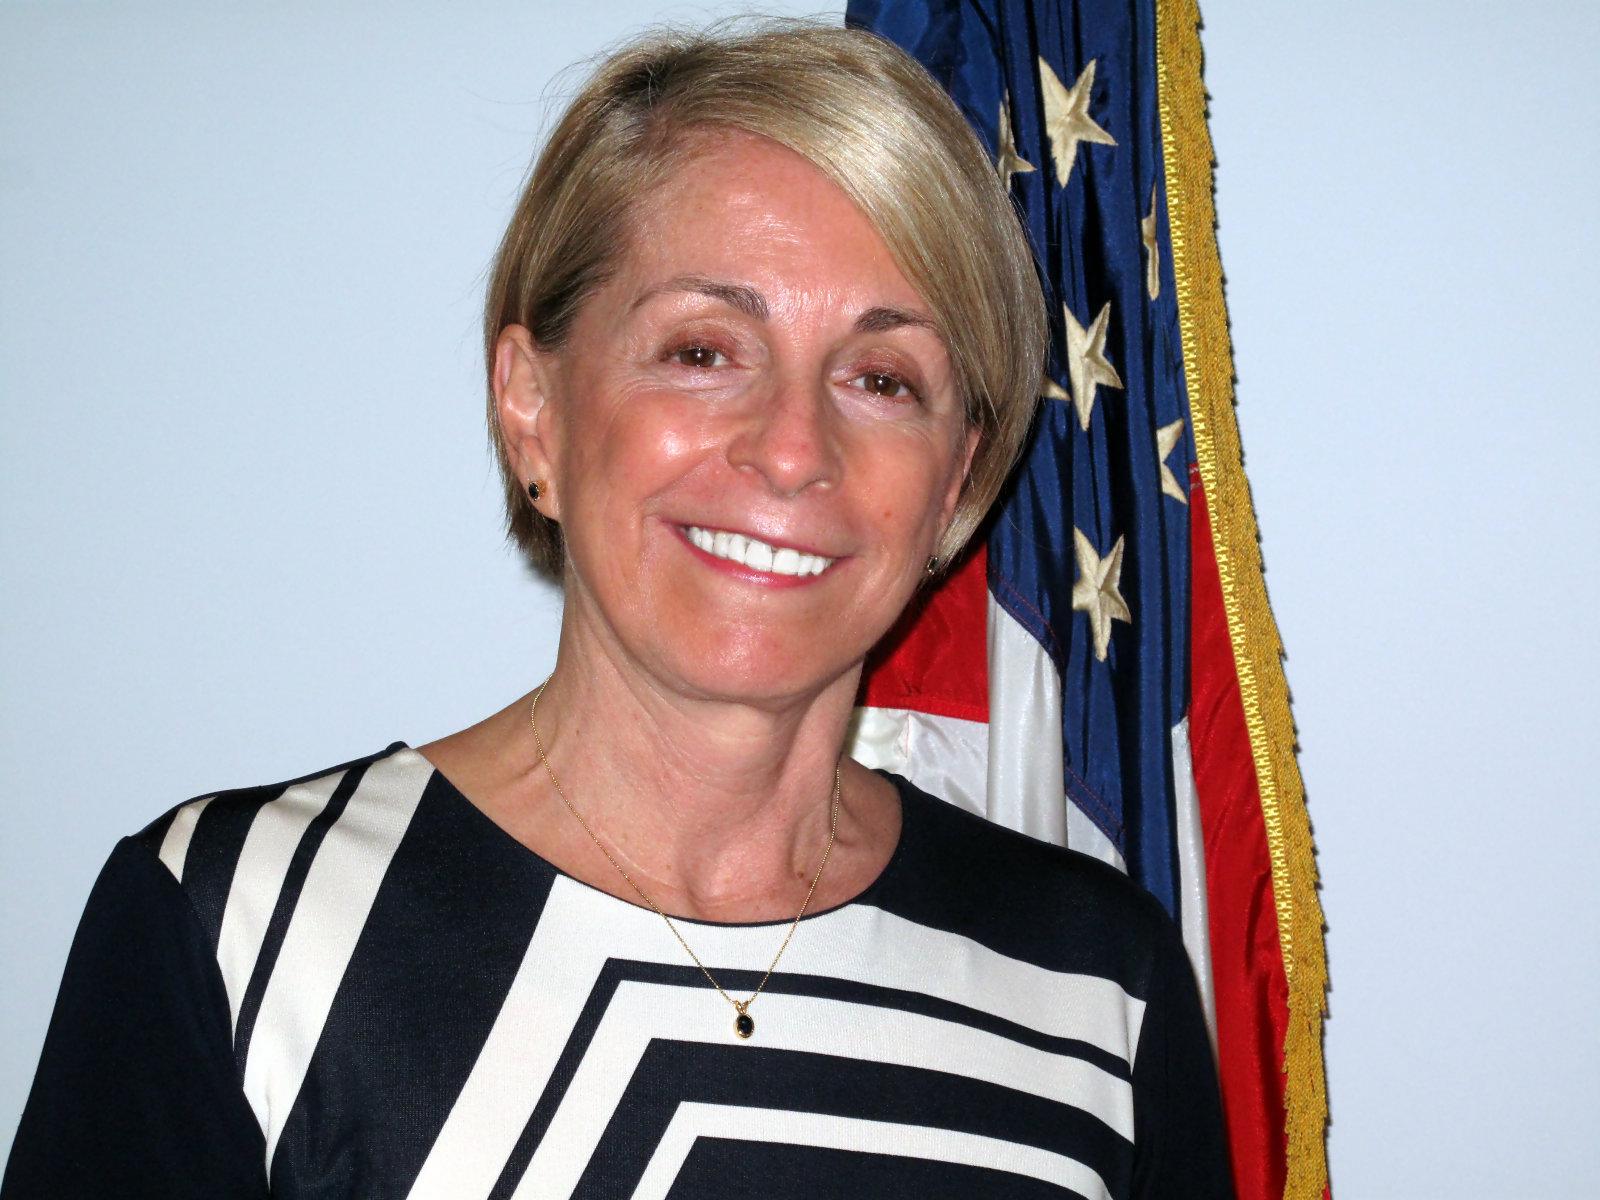 Ann Linehan, OHS Deputy Director  2